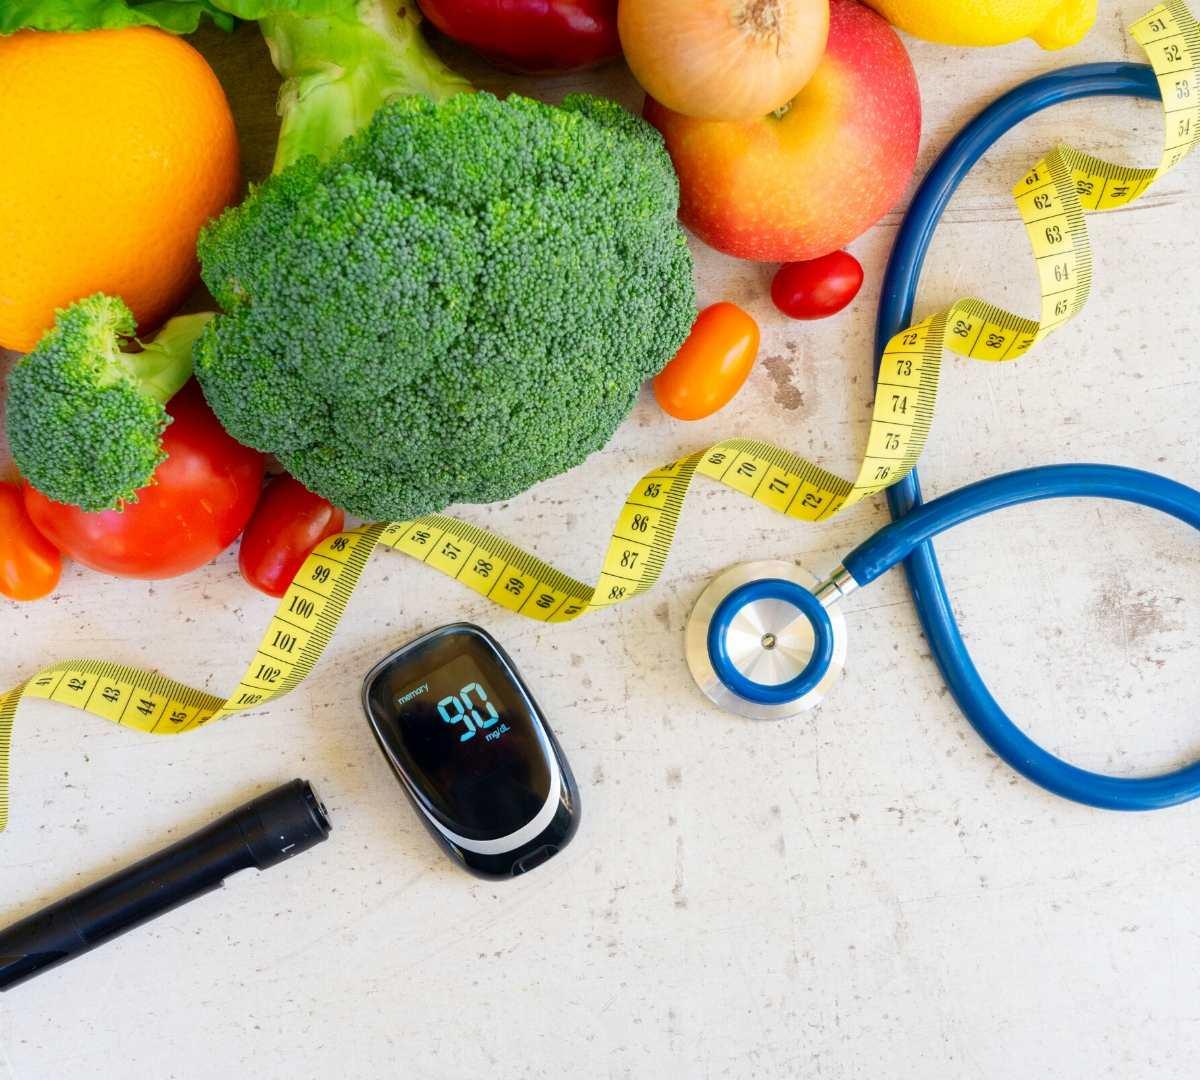 Type 2 Diabetes: Causes, Symptoms & Treatments from Expert Dietitian Louise Bula